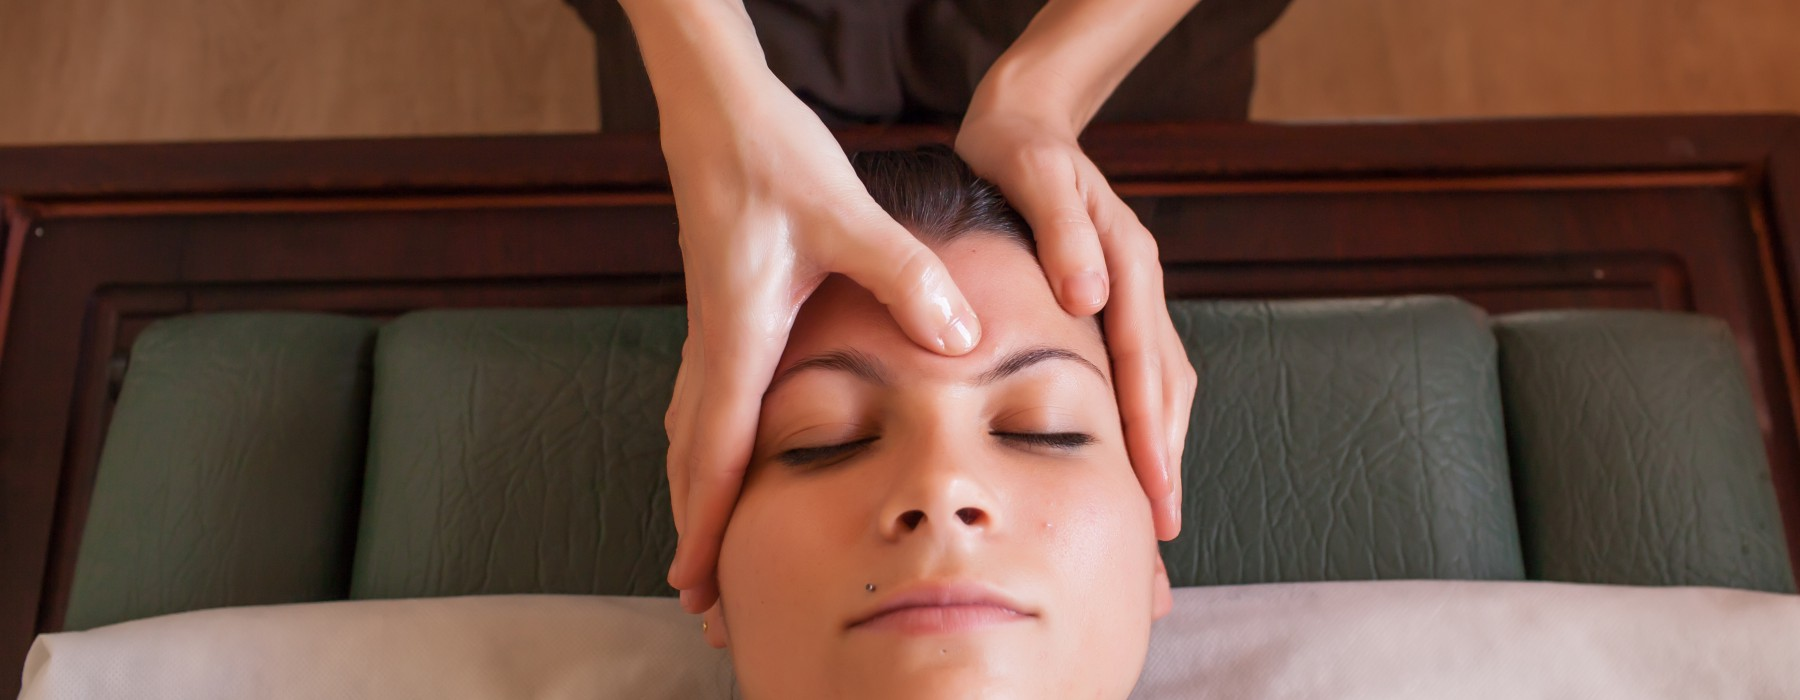 Pack regal massatge